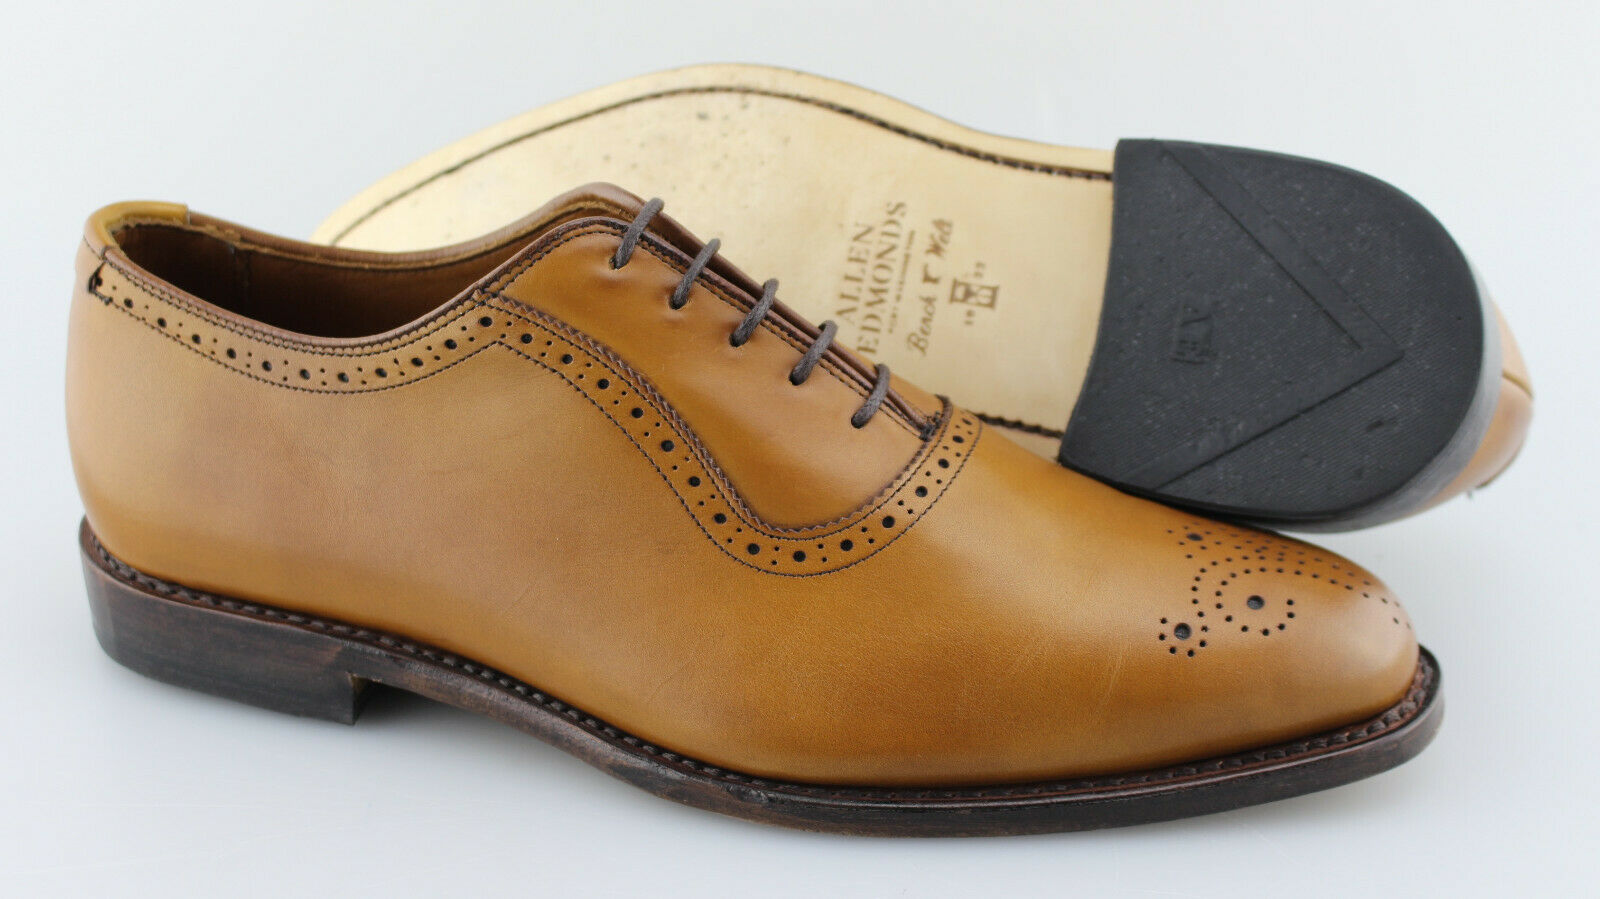 Men's ALLEN EDMONDS 'Cornwallis's nogal marrón cuero oxfords tamaño nos 10-D